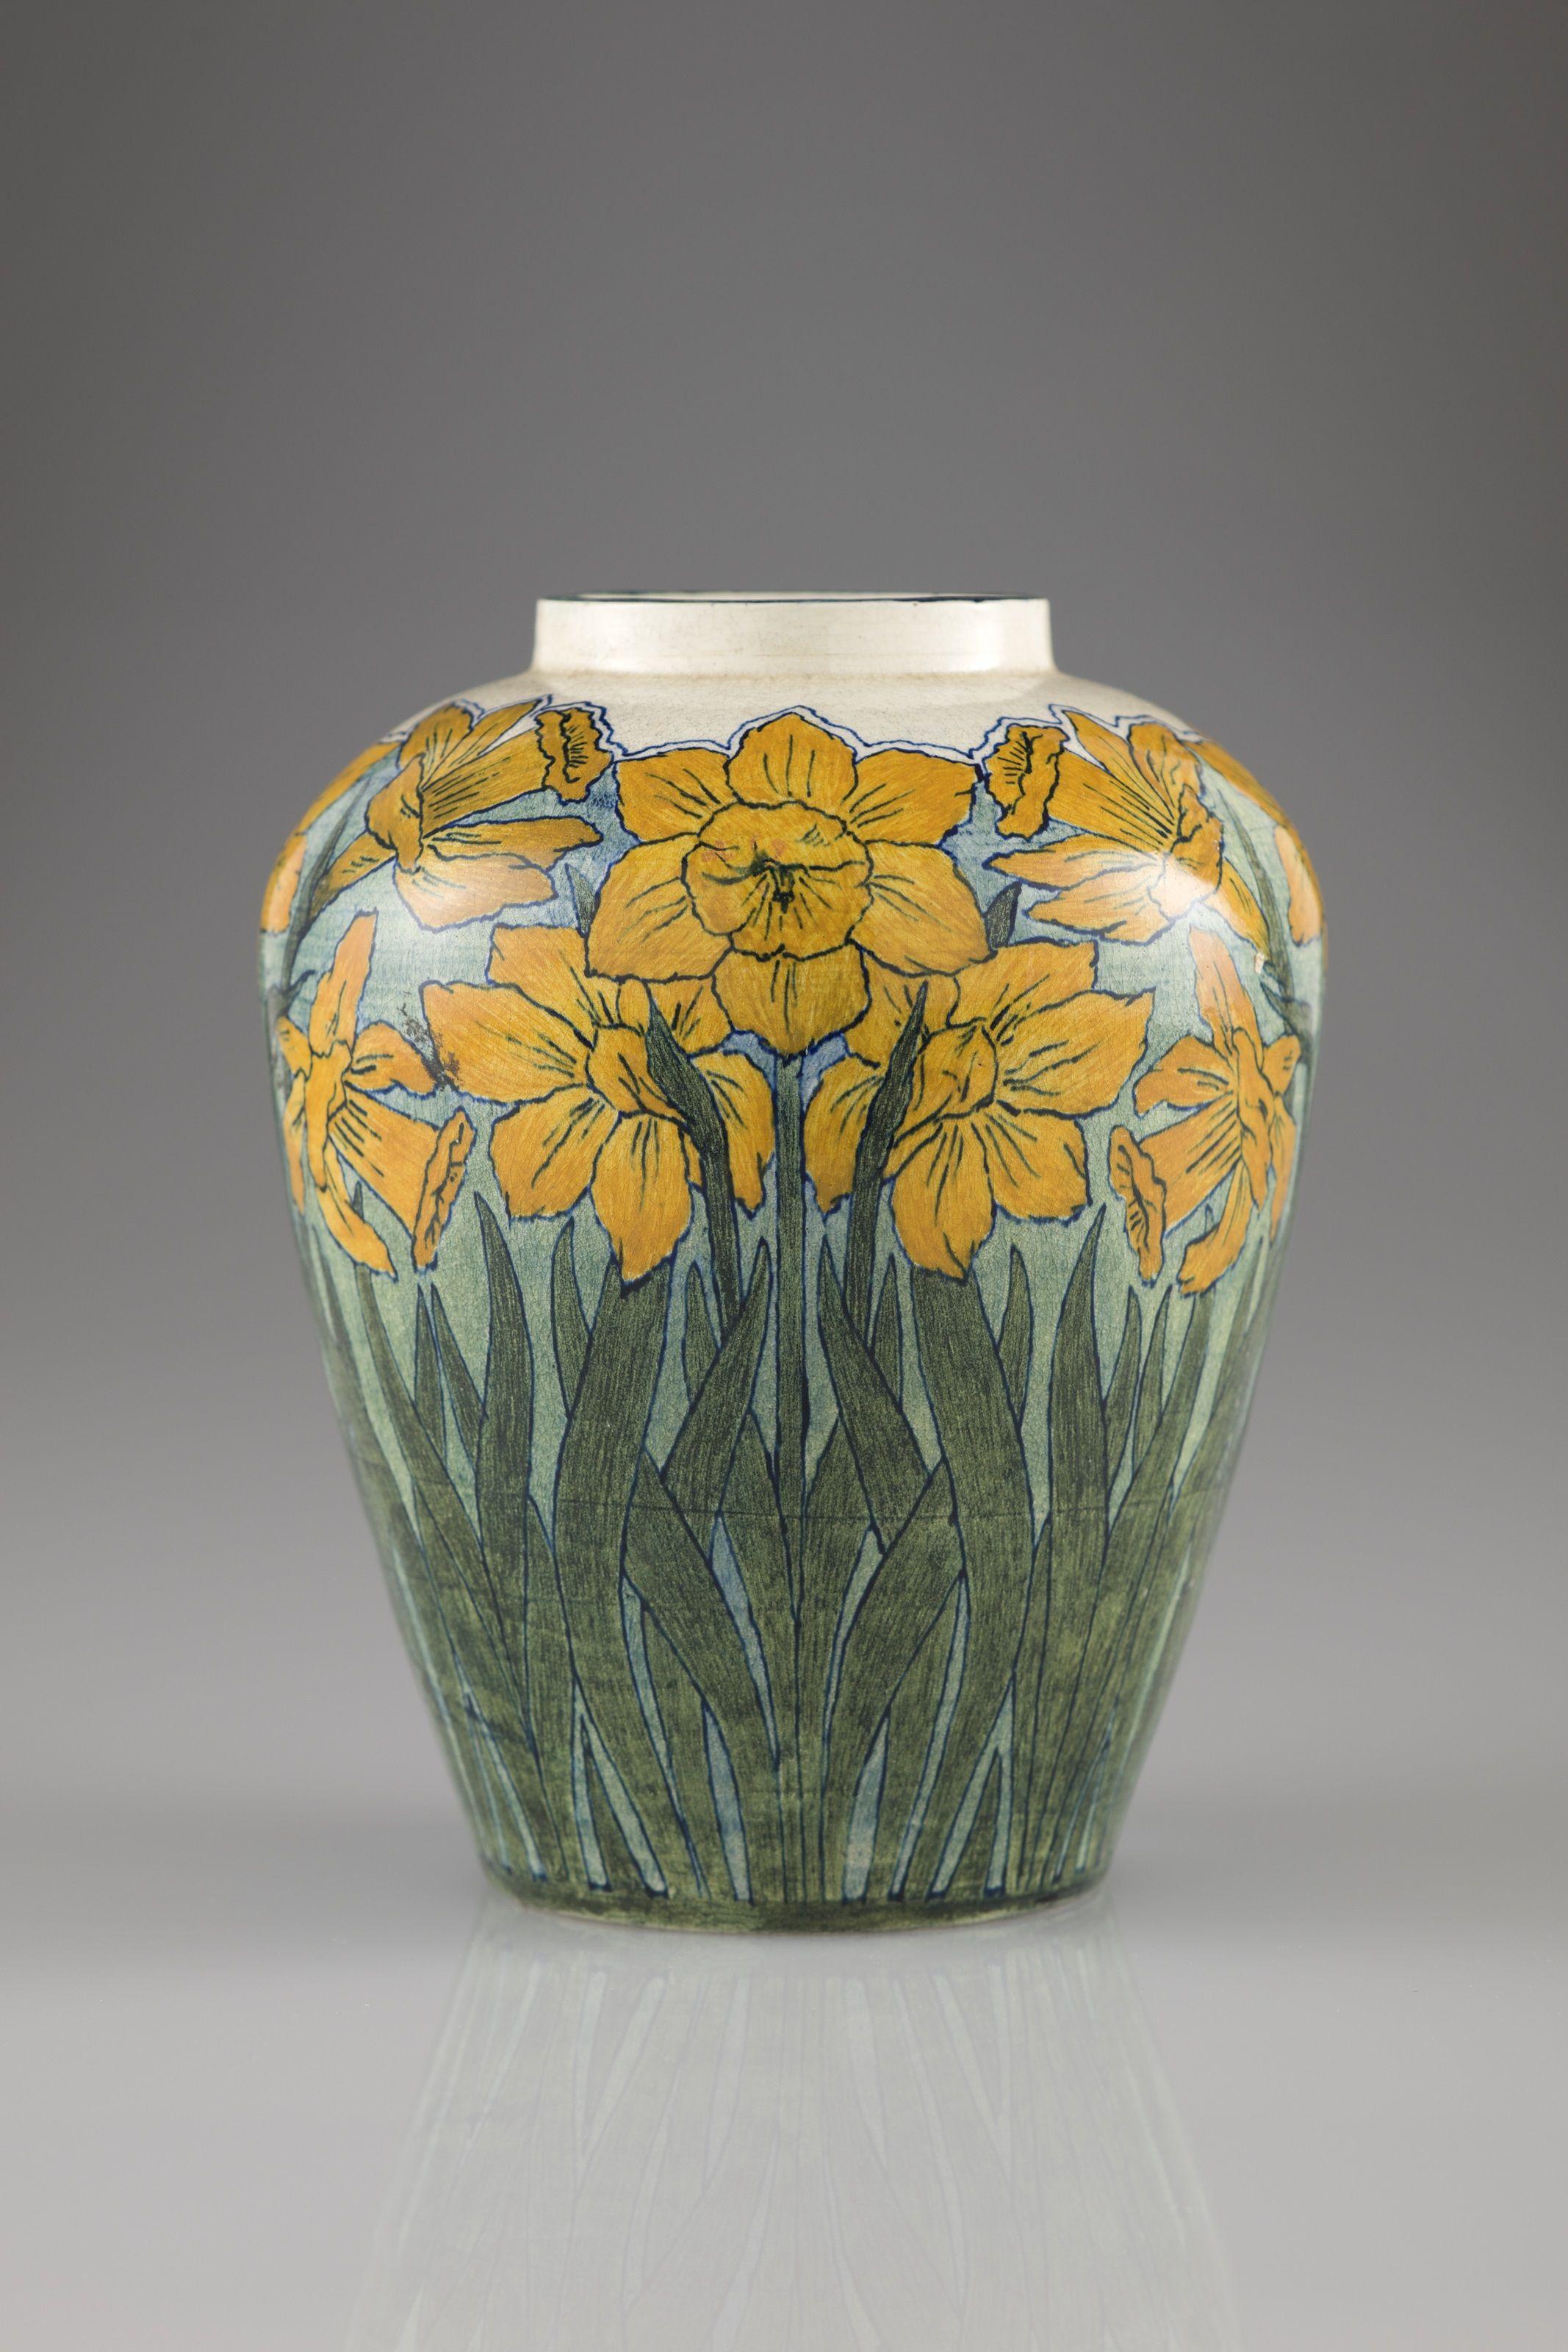 Newcomb pottery newcomb pottery vase newcomb pottery newcomb pottery newcomb pottery vase reviewsmspy